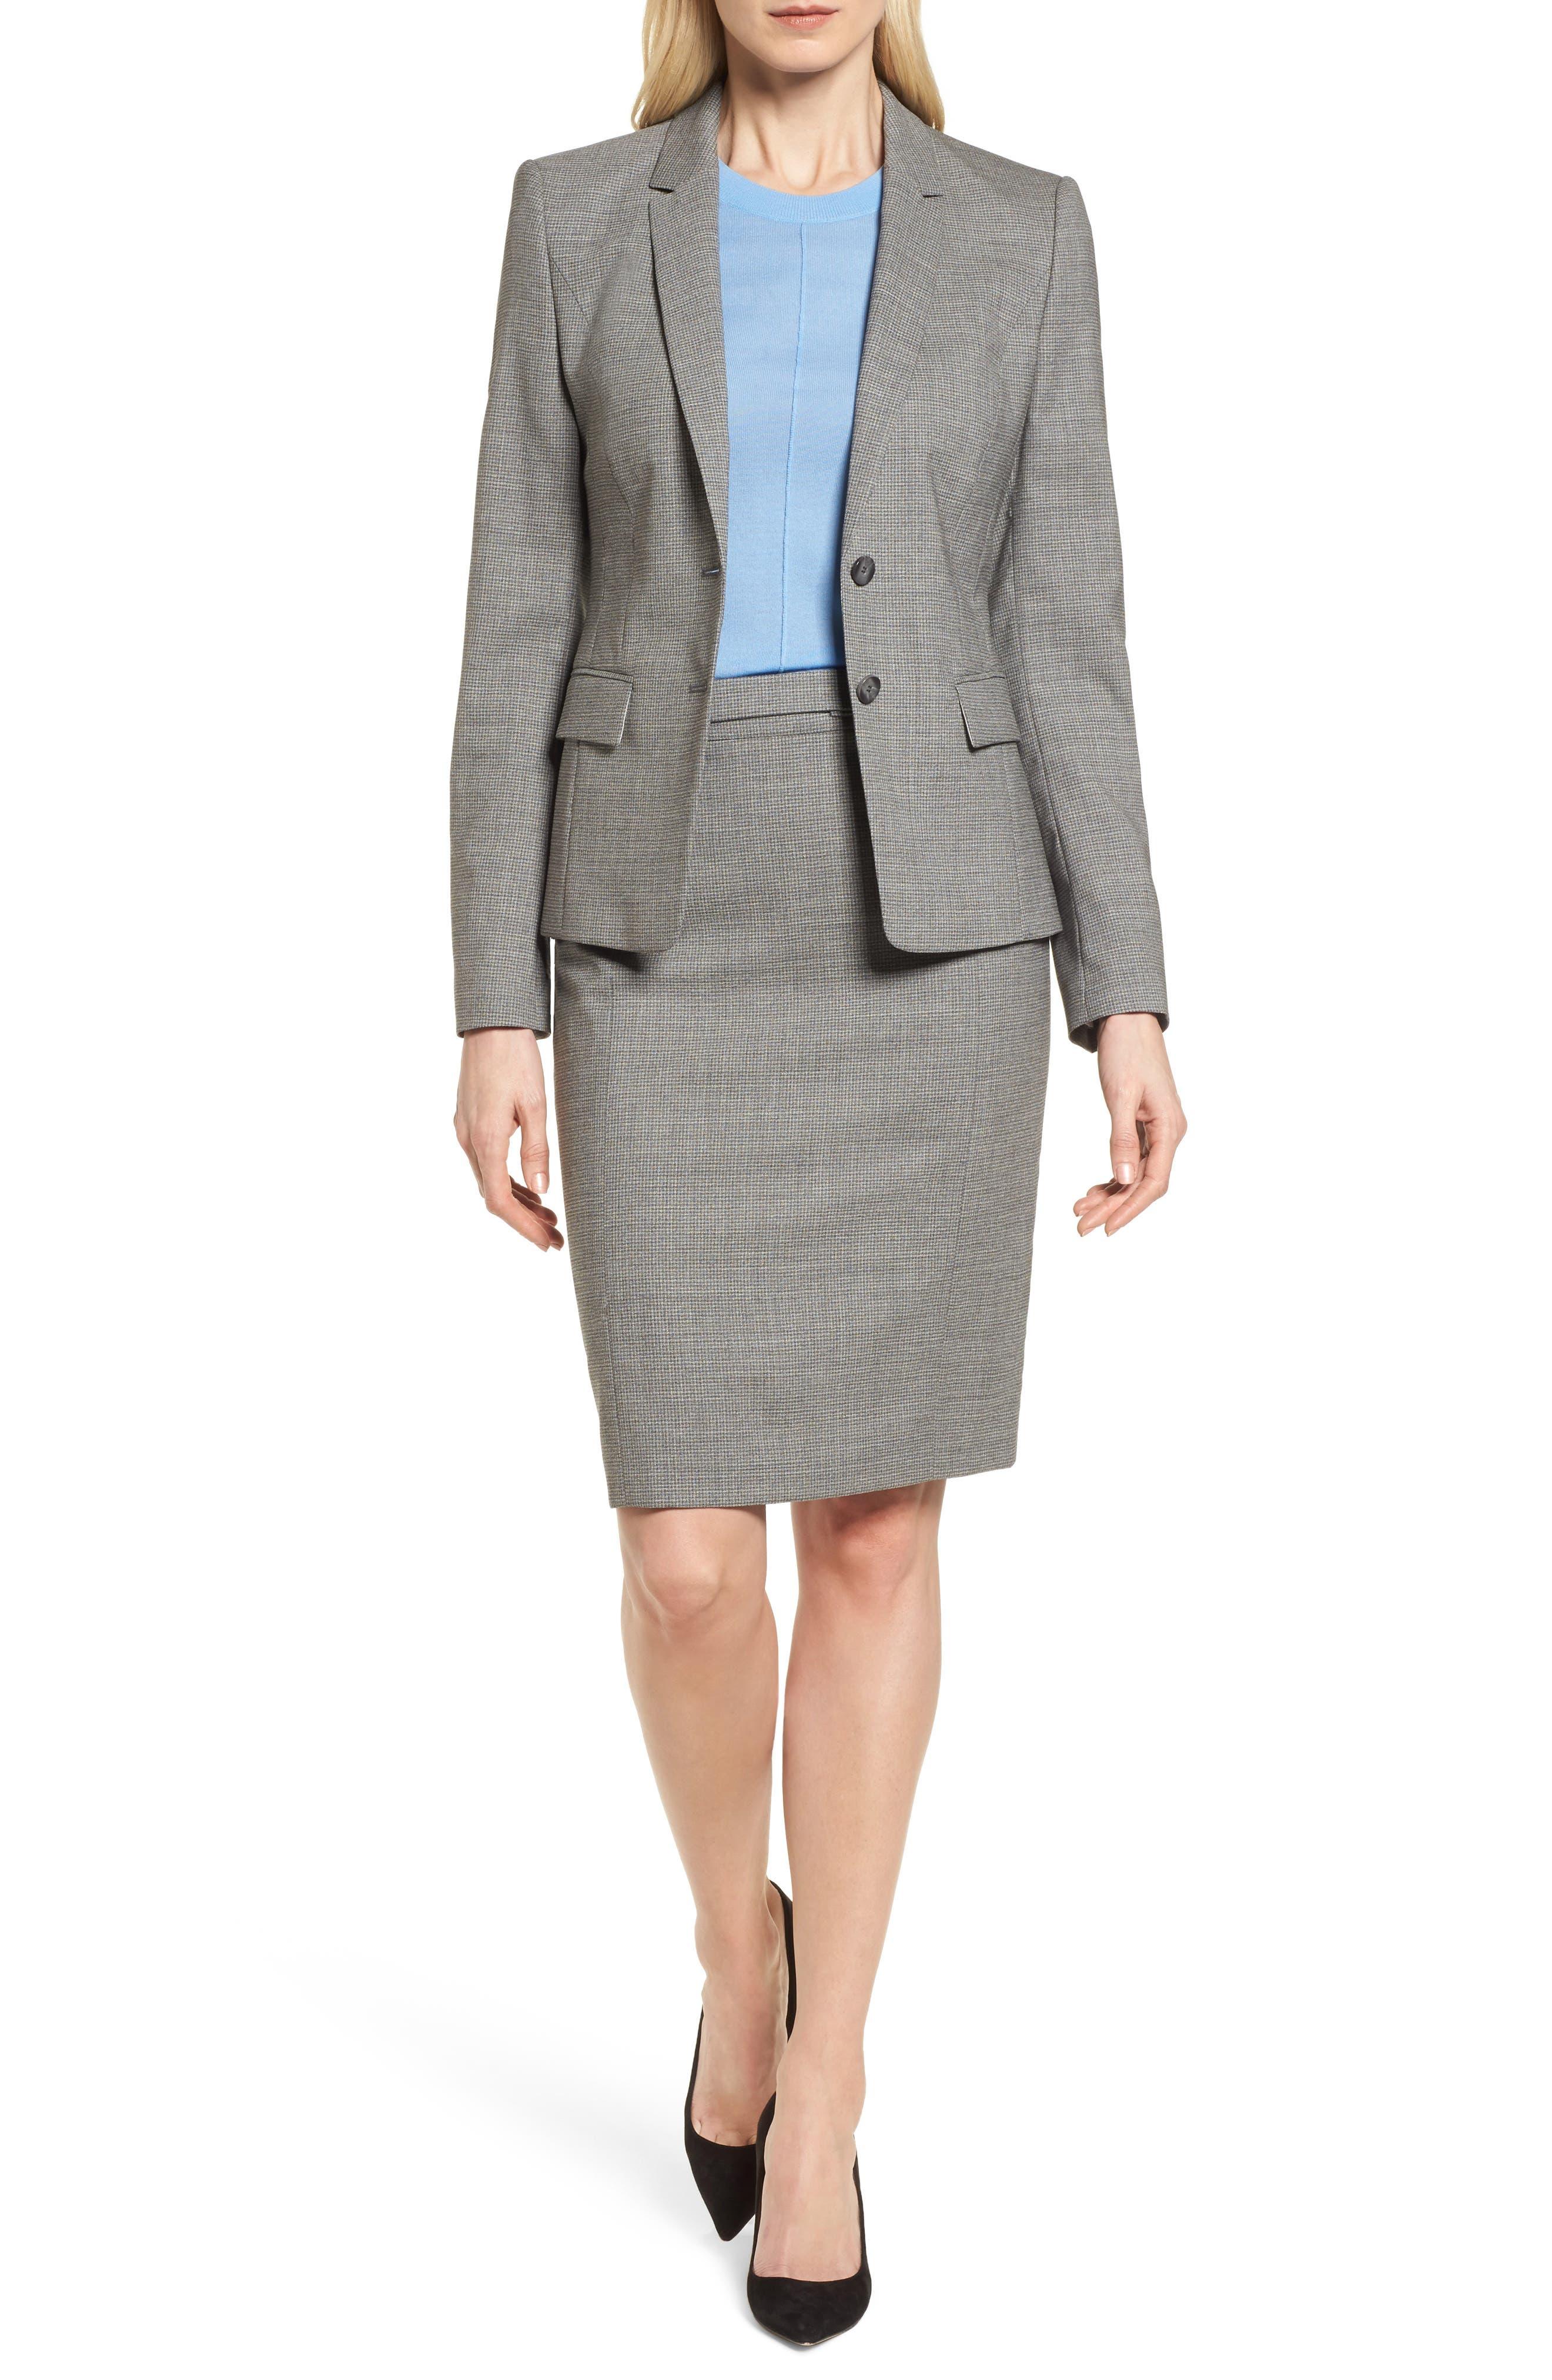 Vewisa Check Wool Suit Skirt,                             Alternate thumbnail 7, color,                             Cozy Grey Melange Fantasy